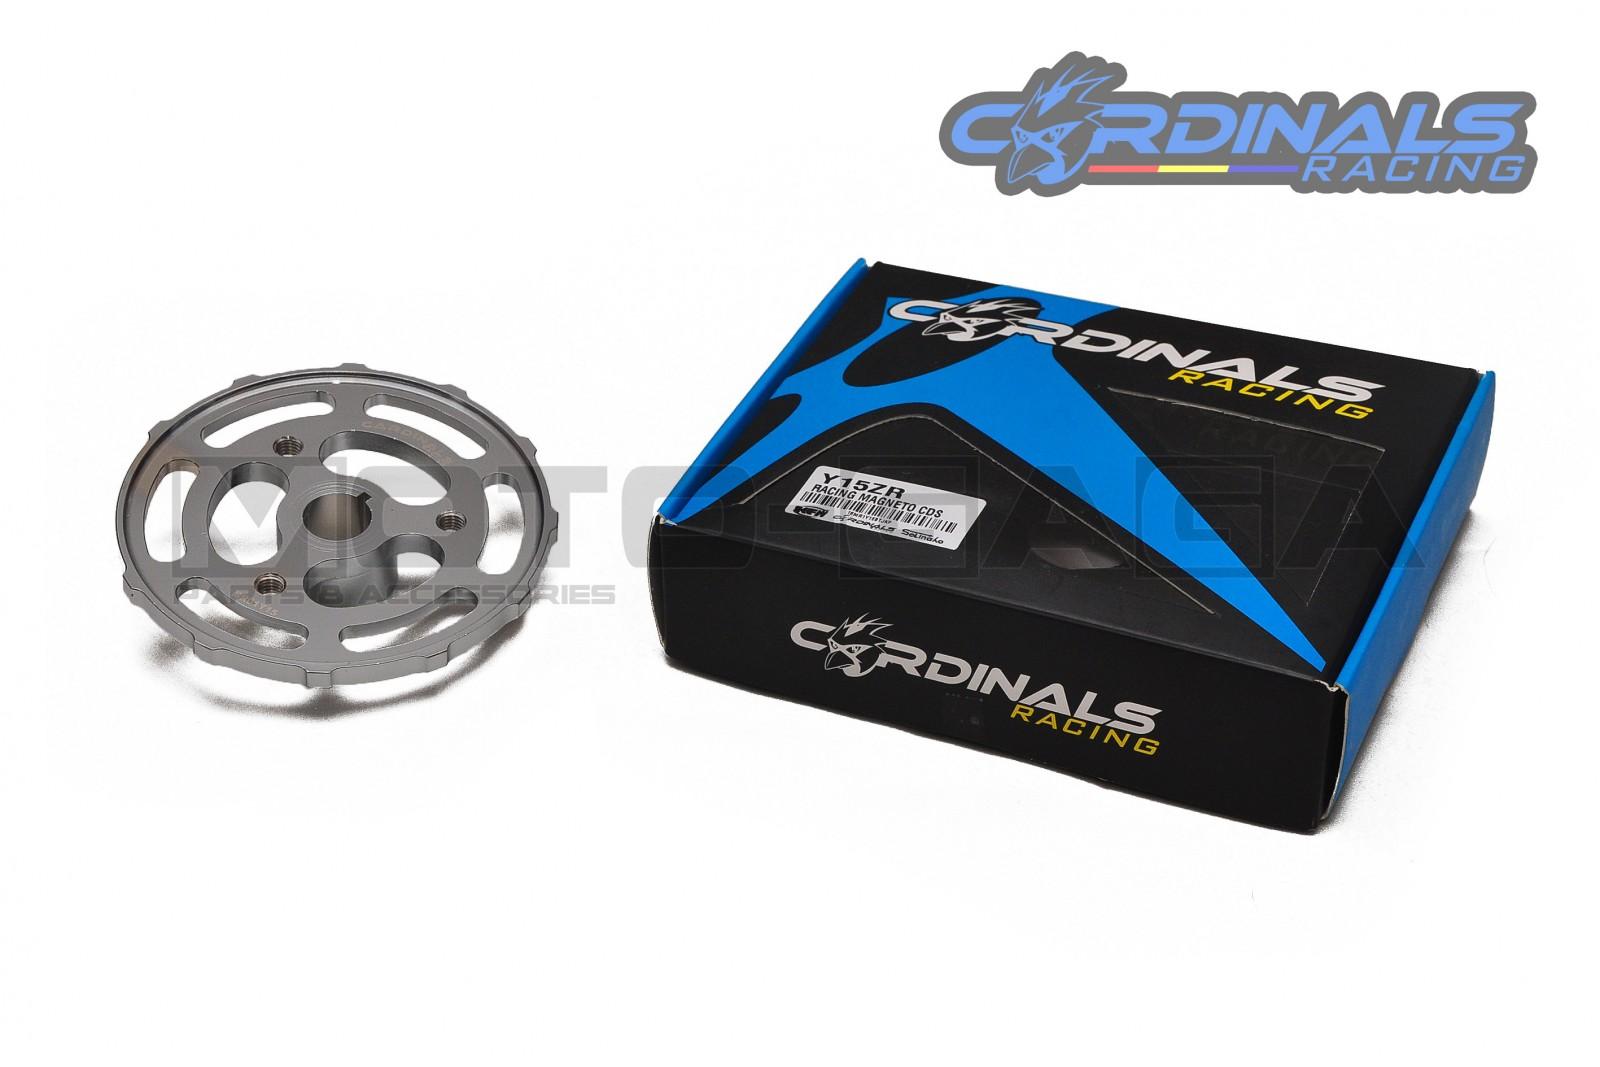 Cardinals Racing Lightweight CNC Magneto Flywheel - Yamaha T150/Fz150i Vixion